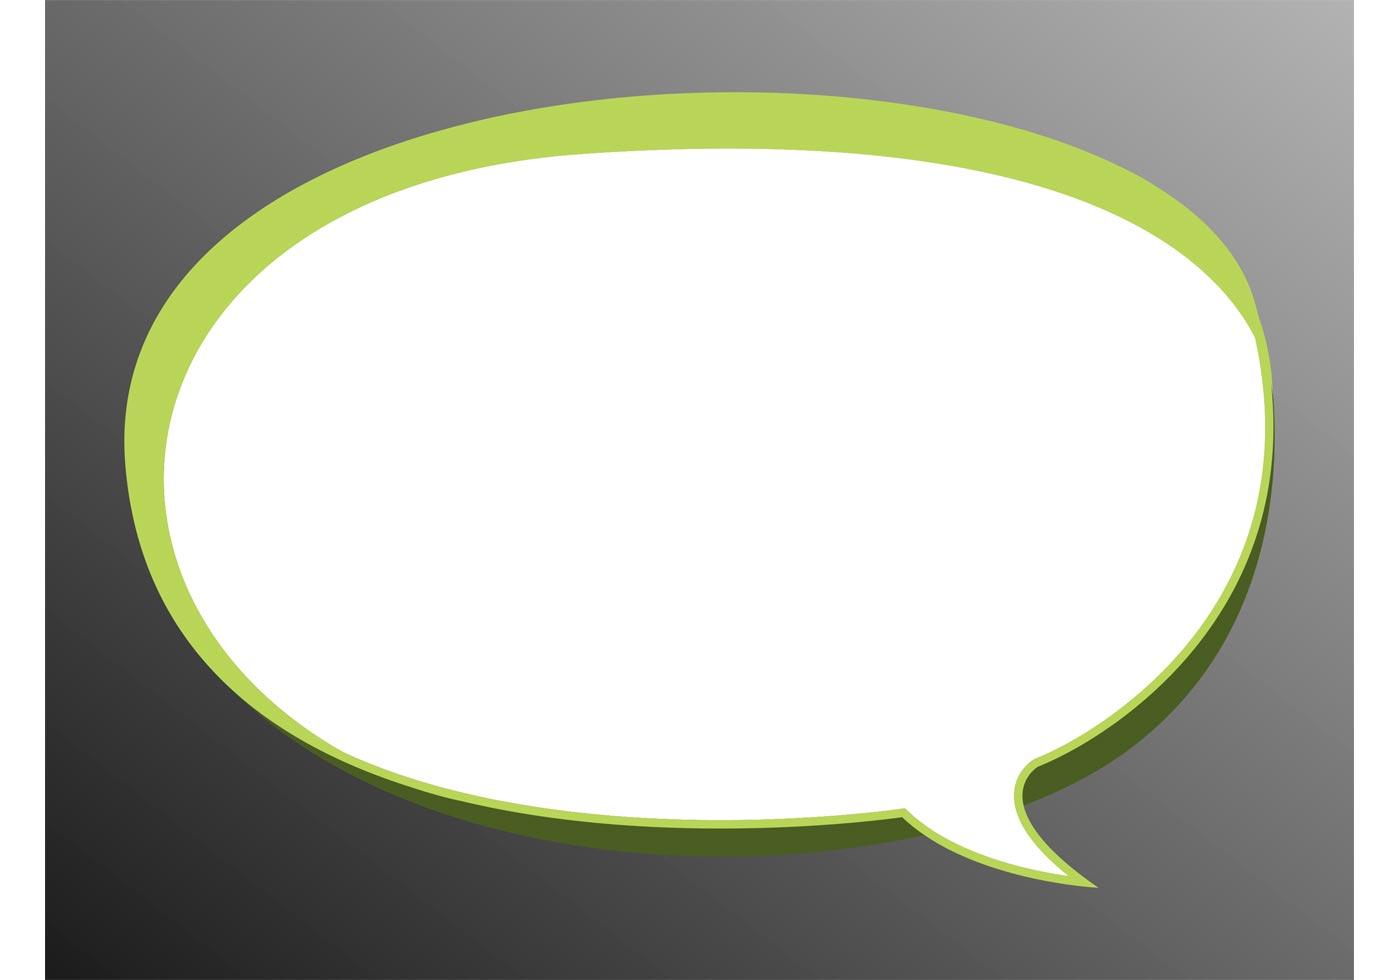 Blank Text Message Bubble Speech Bubble Vector -...